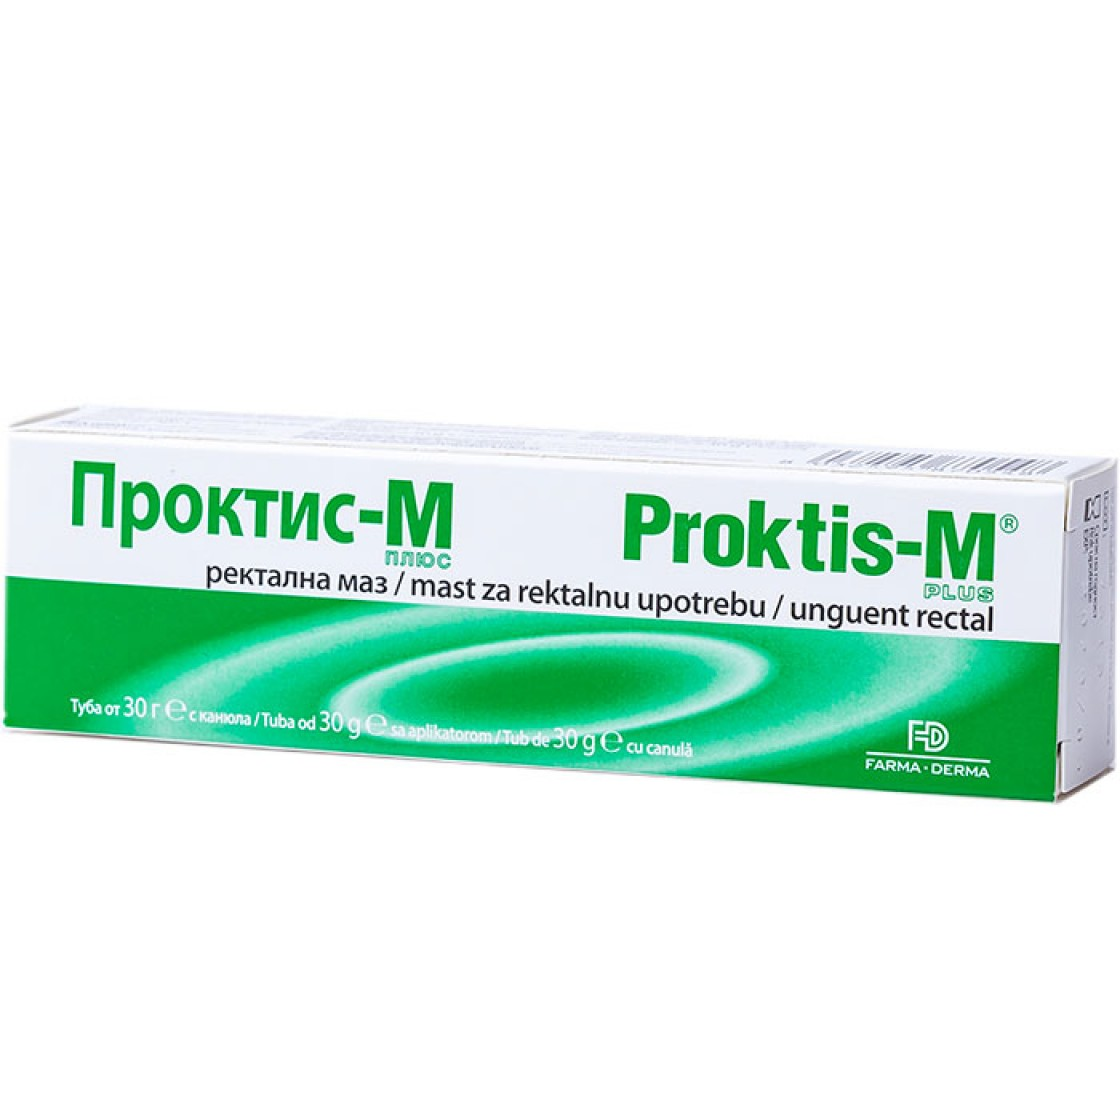 Proktis-M unguent, 30 g, Farma-Derma drmax poza